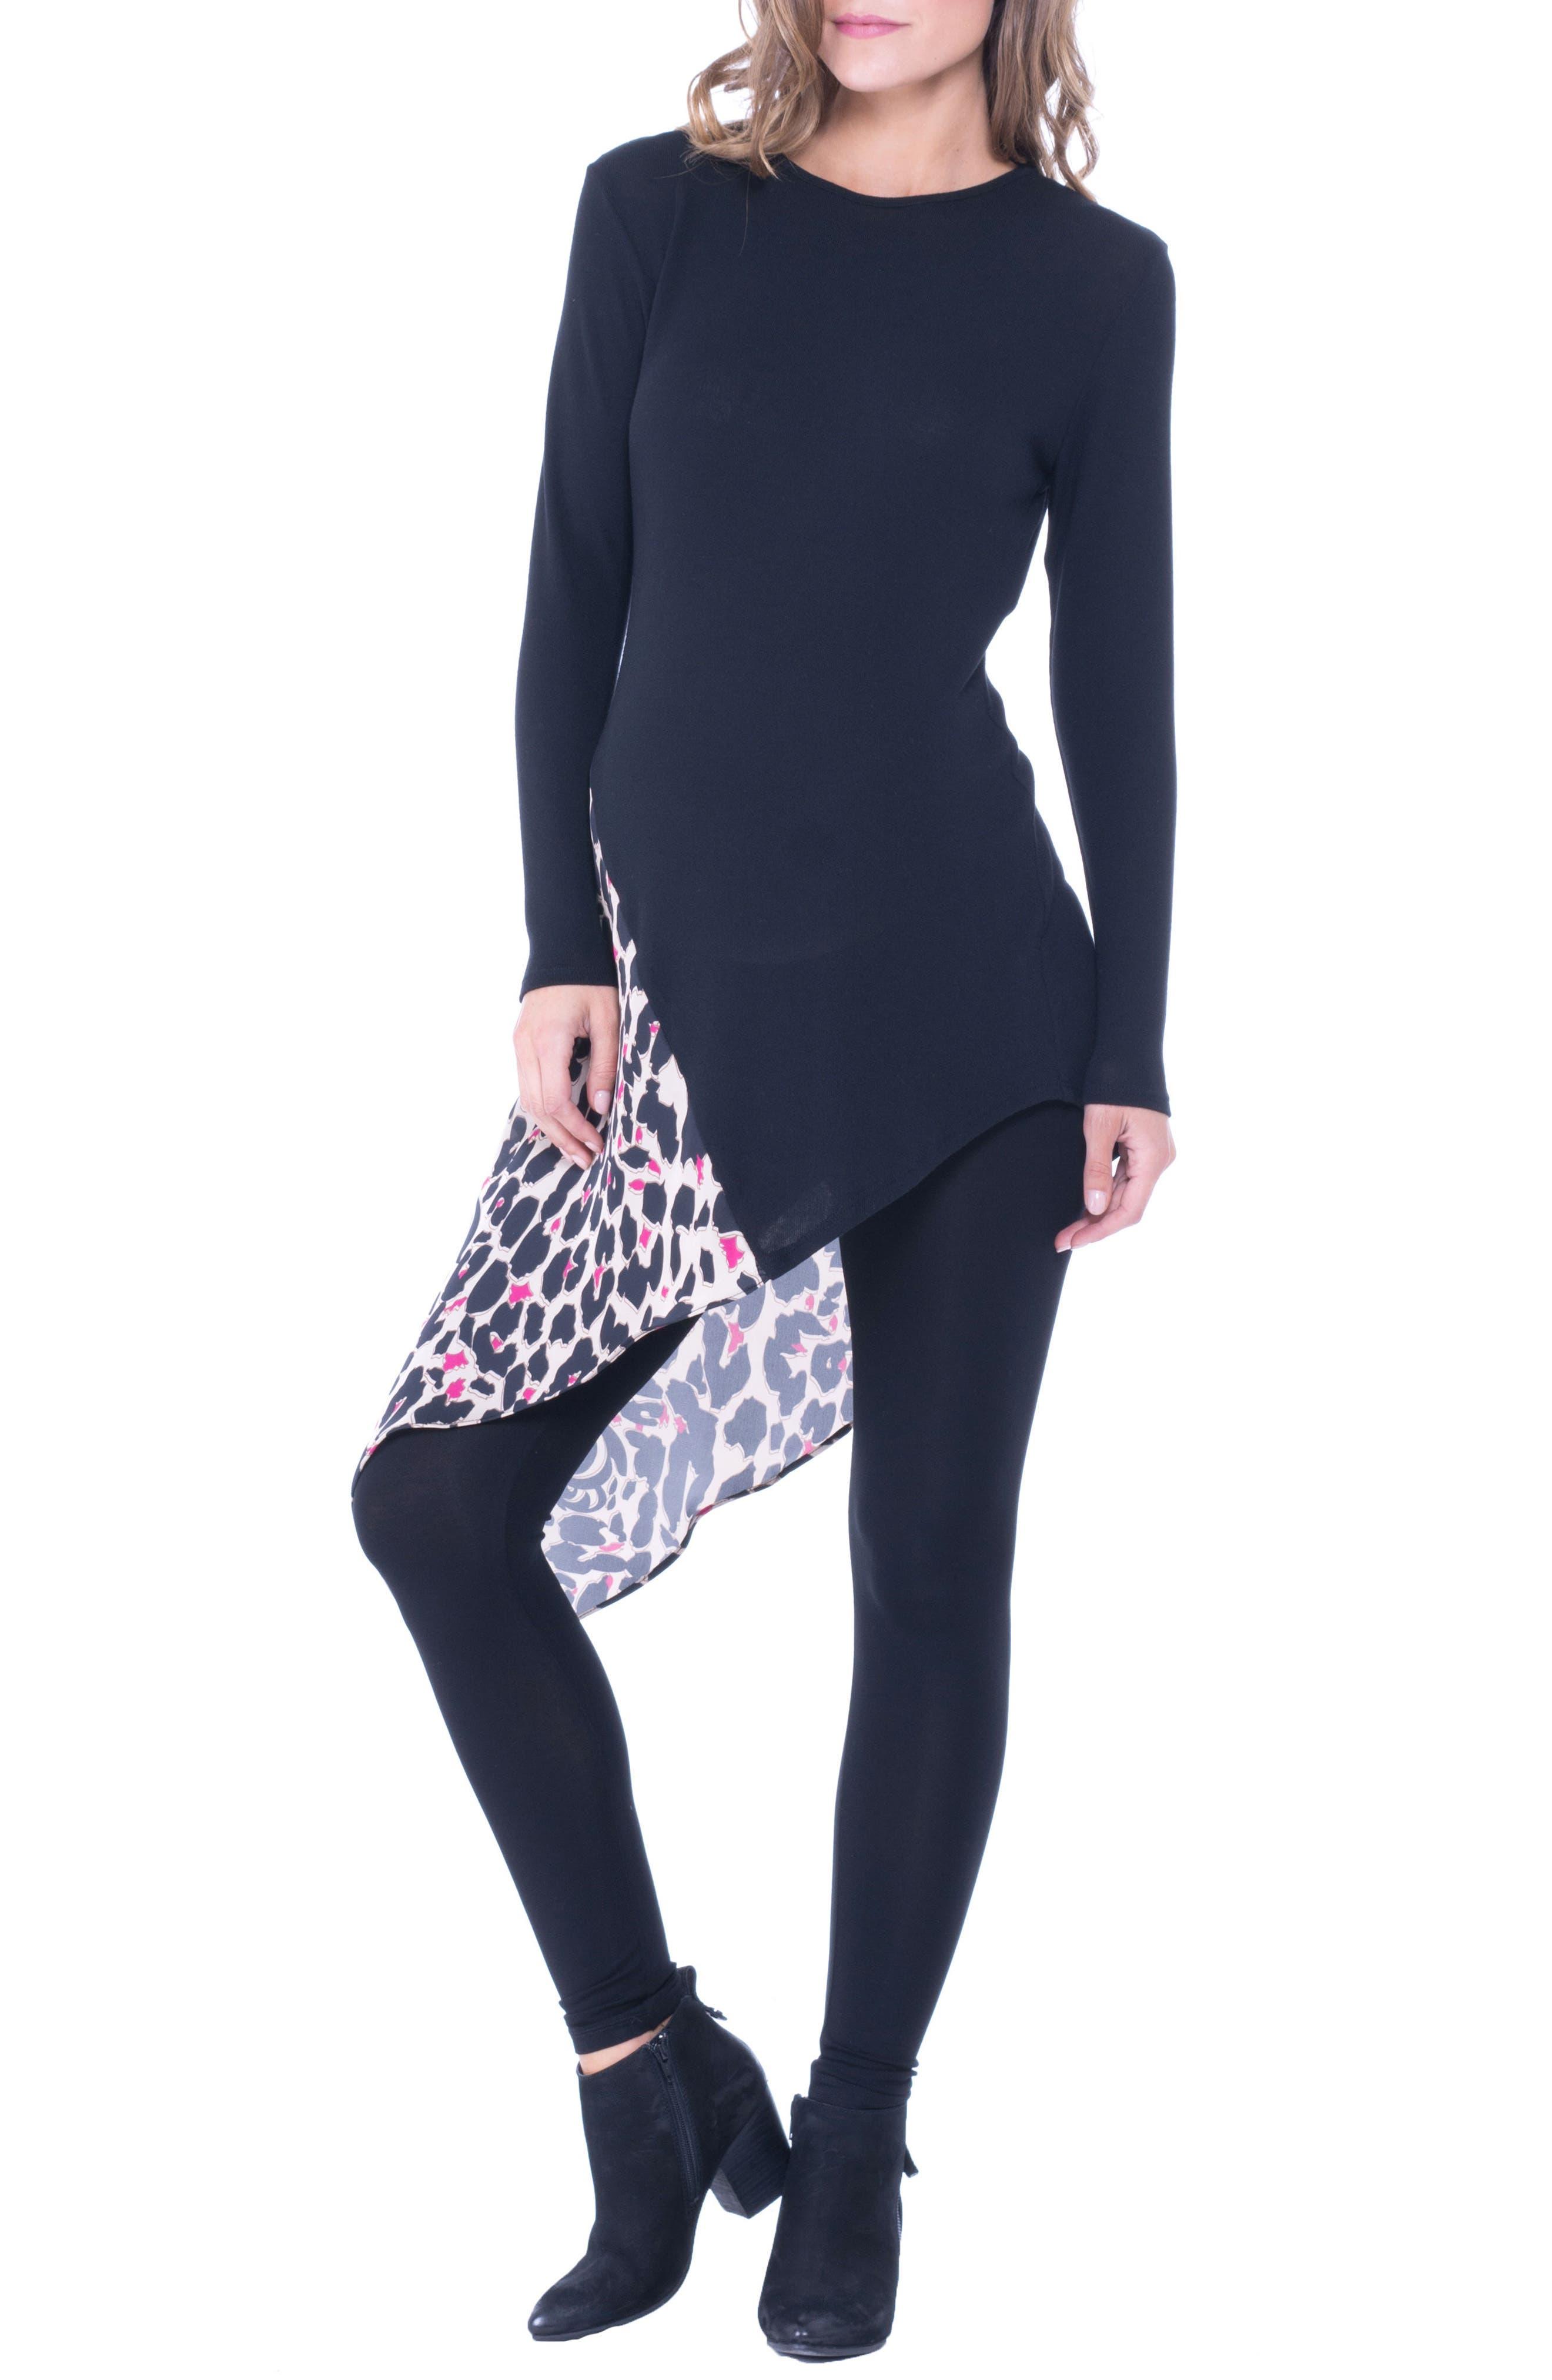 Leah Animal Print Side Tie Maternity Top,                             Main thumbnail 1, color,                             BLACK